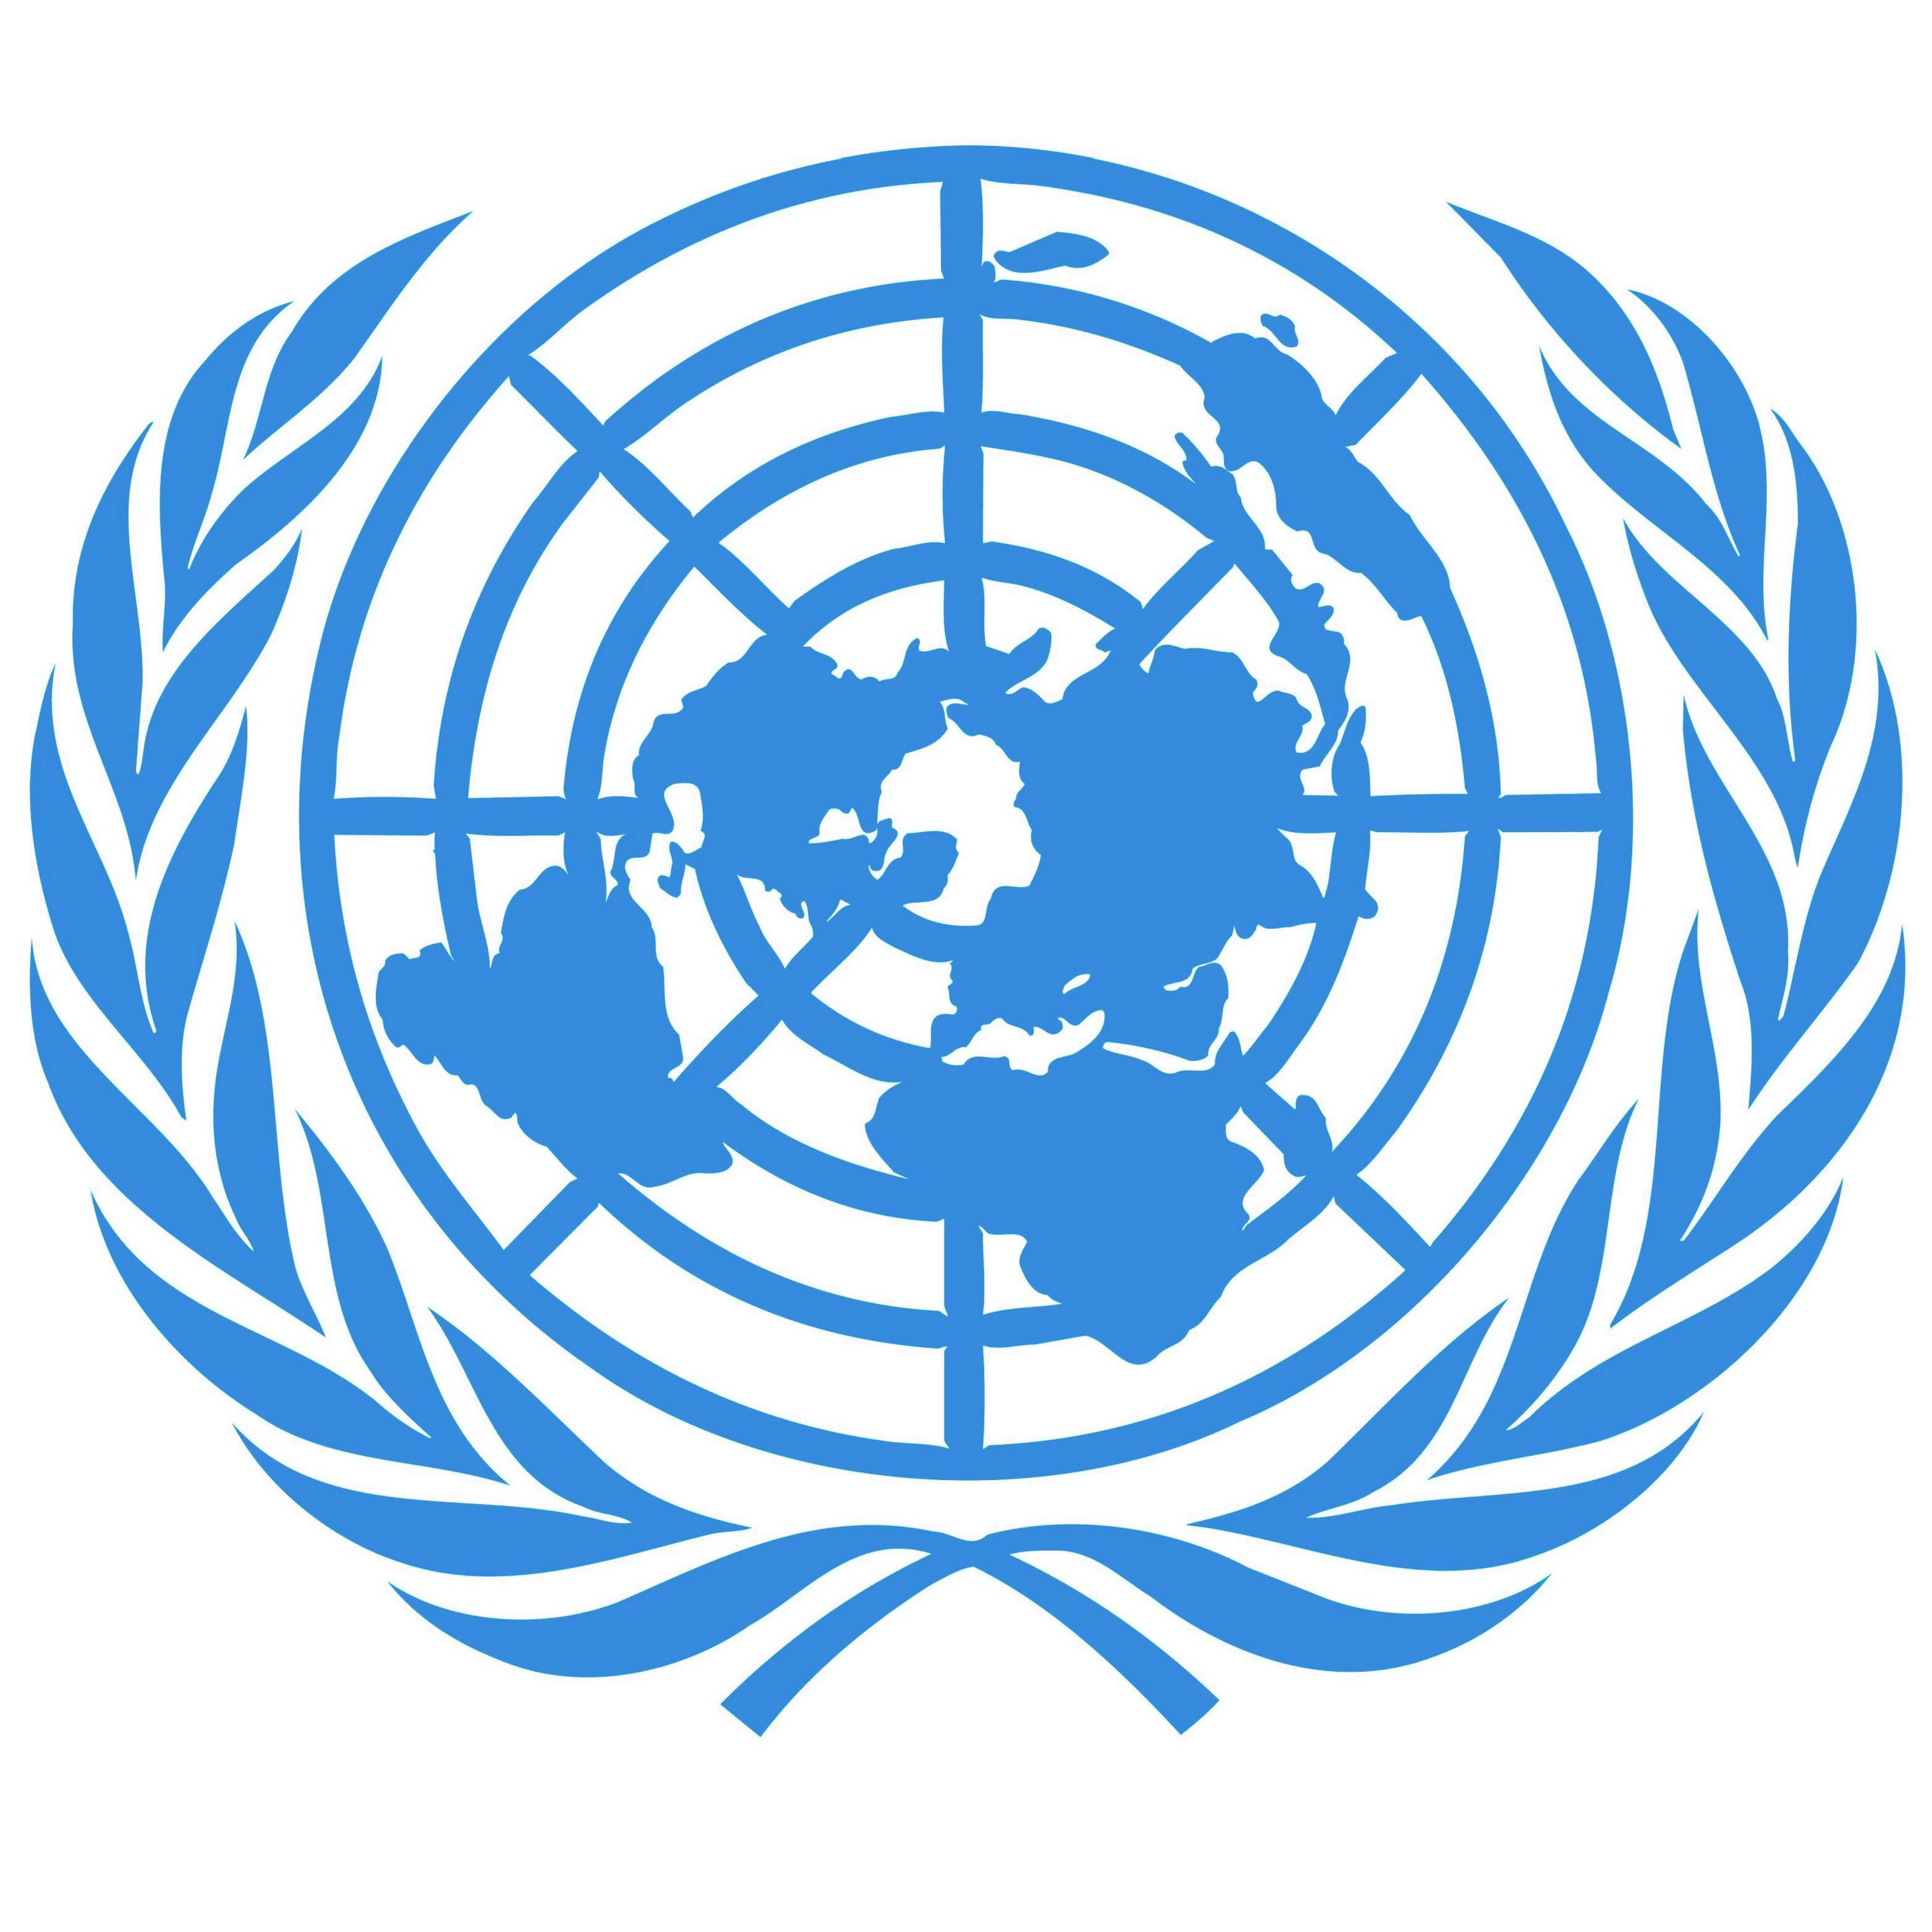 un logo united nations usa world peace www un orgUn Human Rights Logo